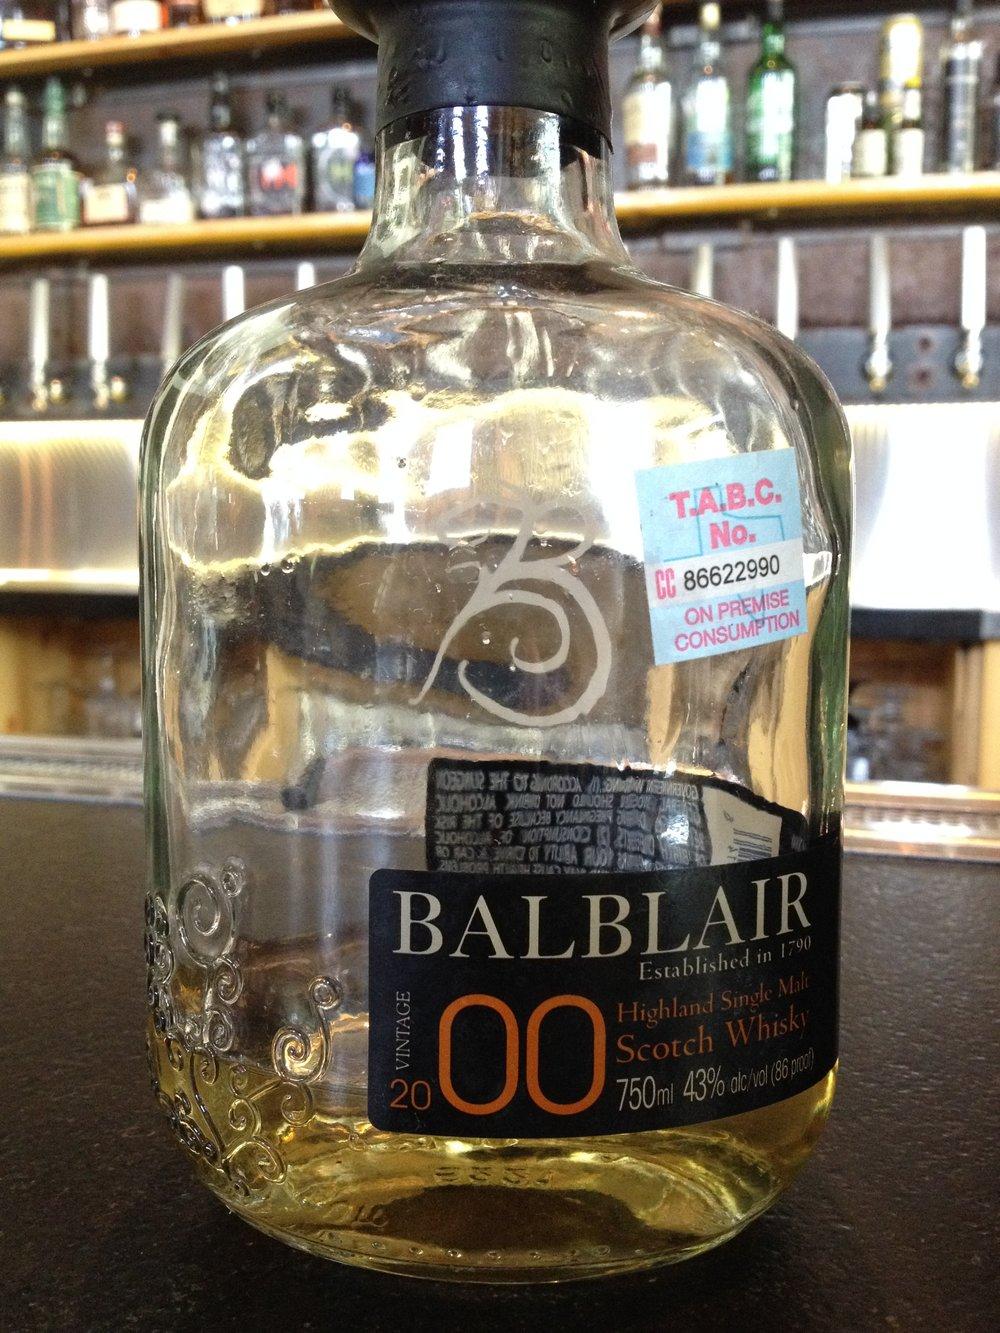 10 Year Old | 43% ABV - Distillery | Balblair